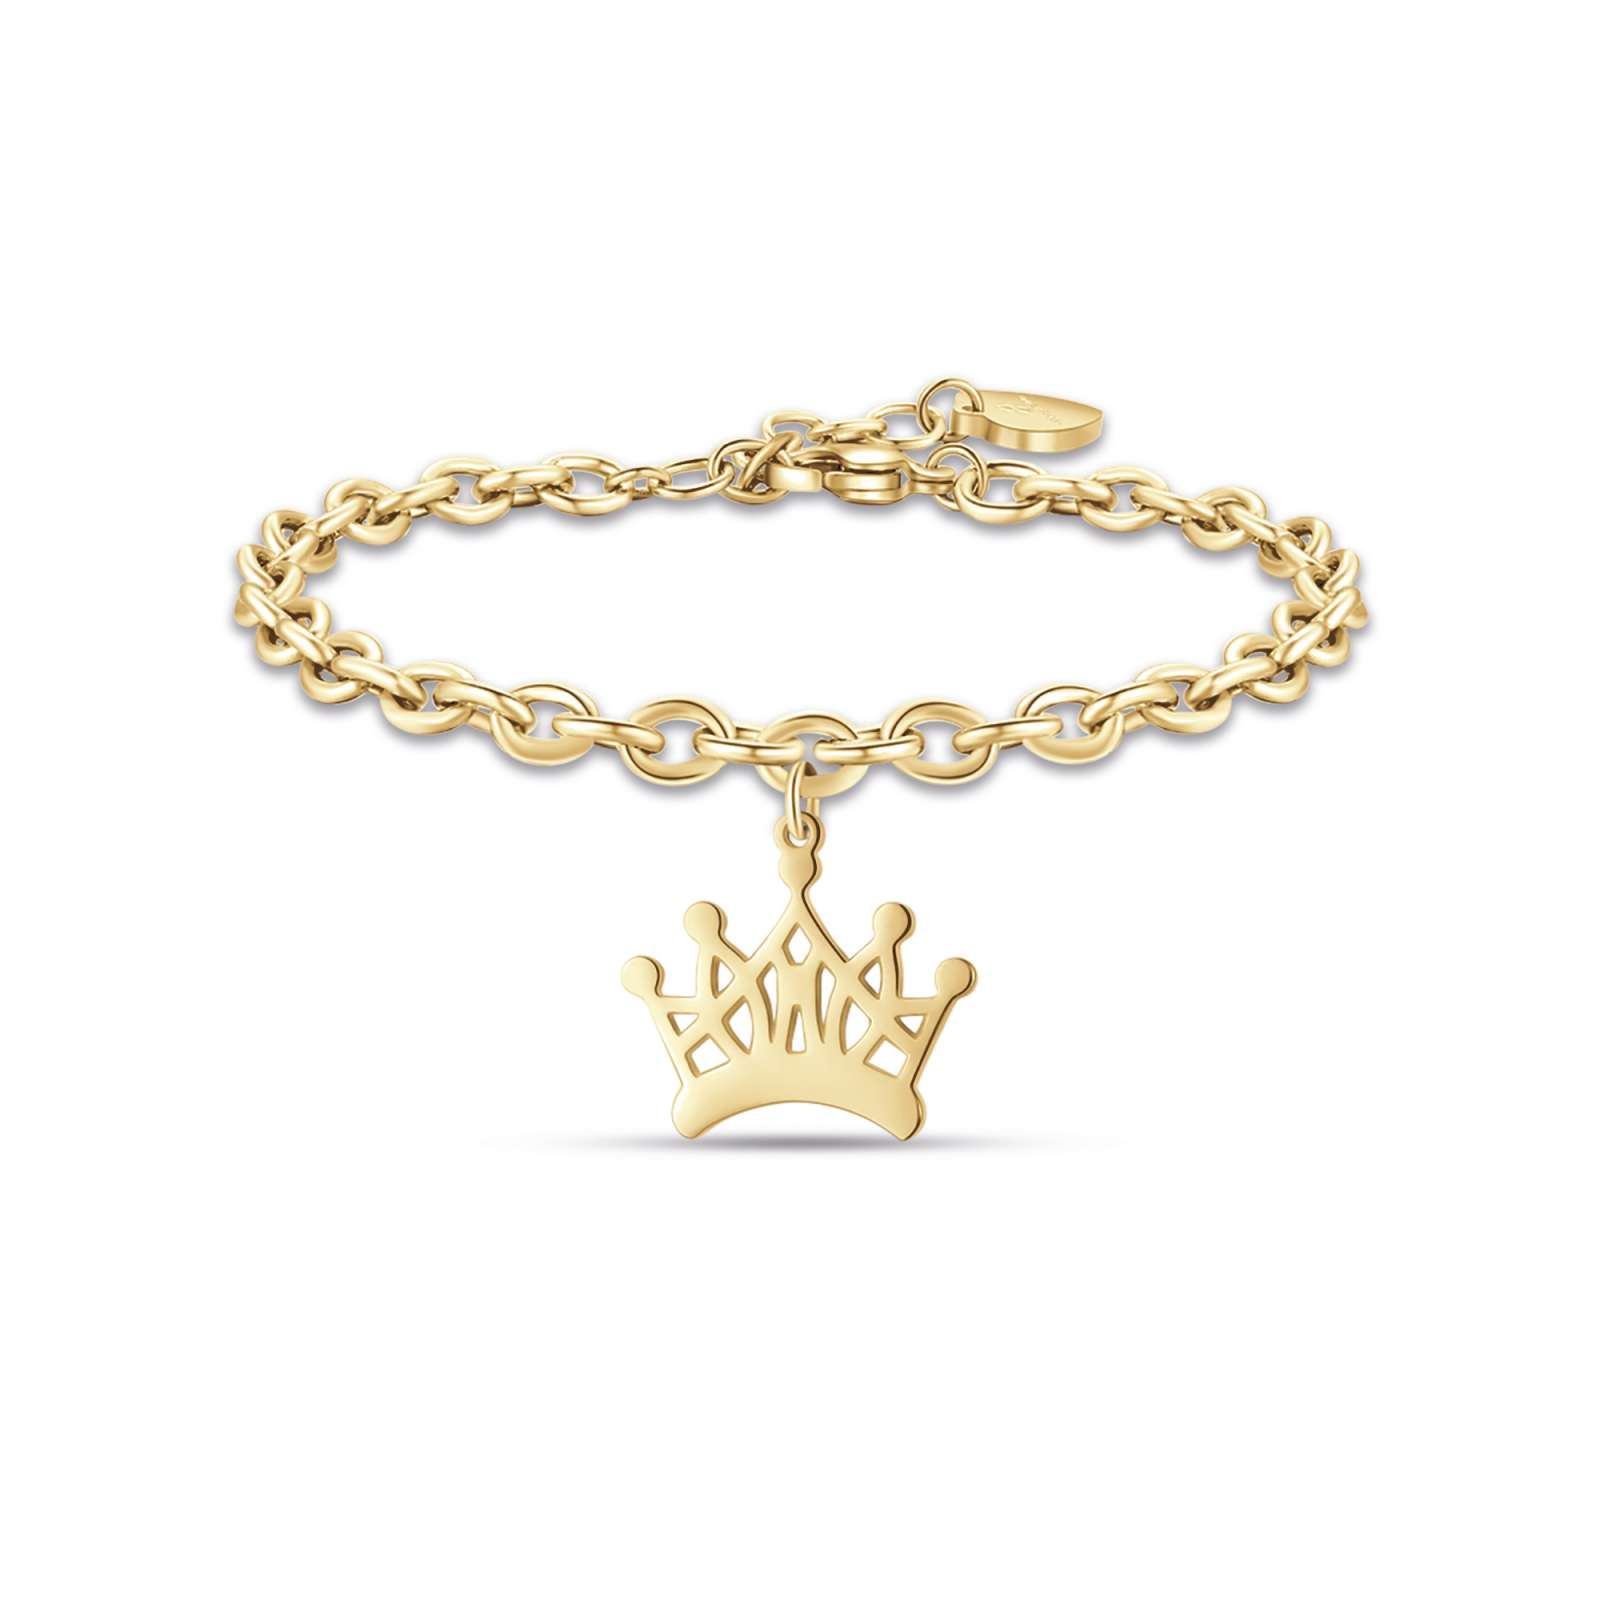 Luca Barra - Bracciale in acciaio ip gold con corona